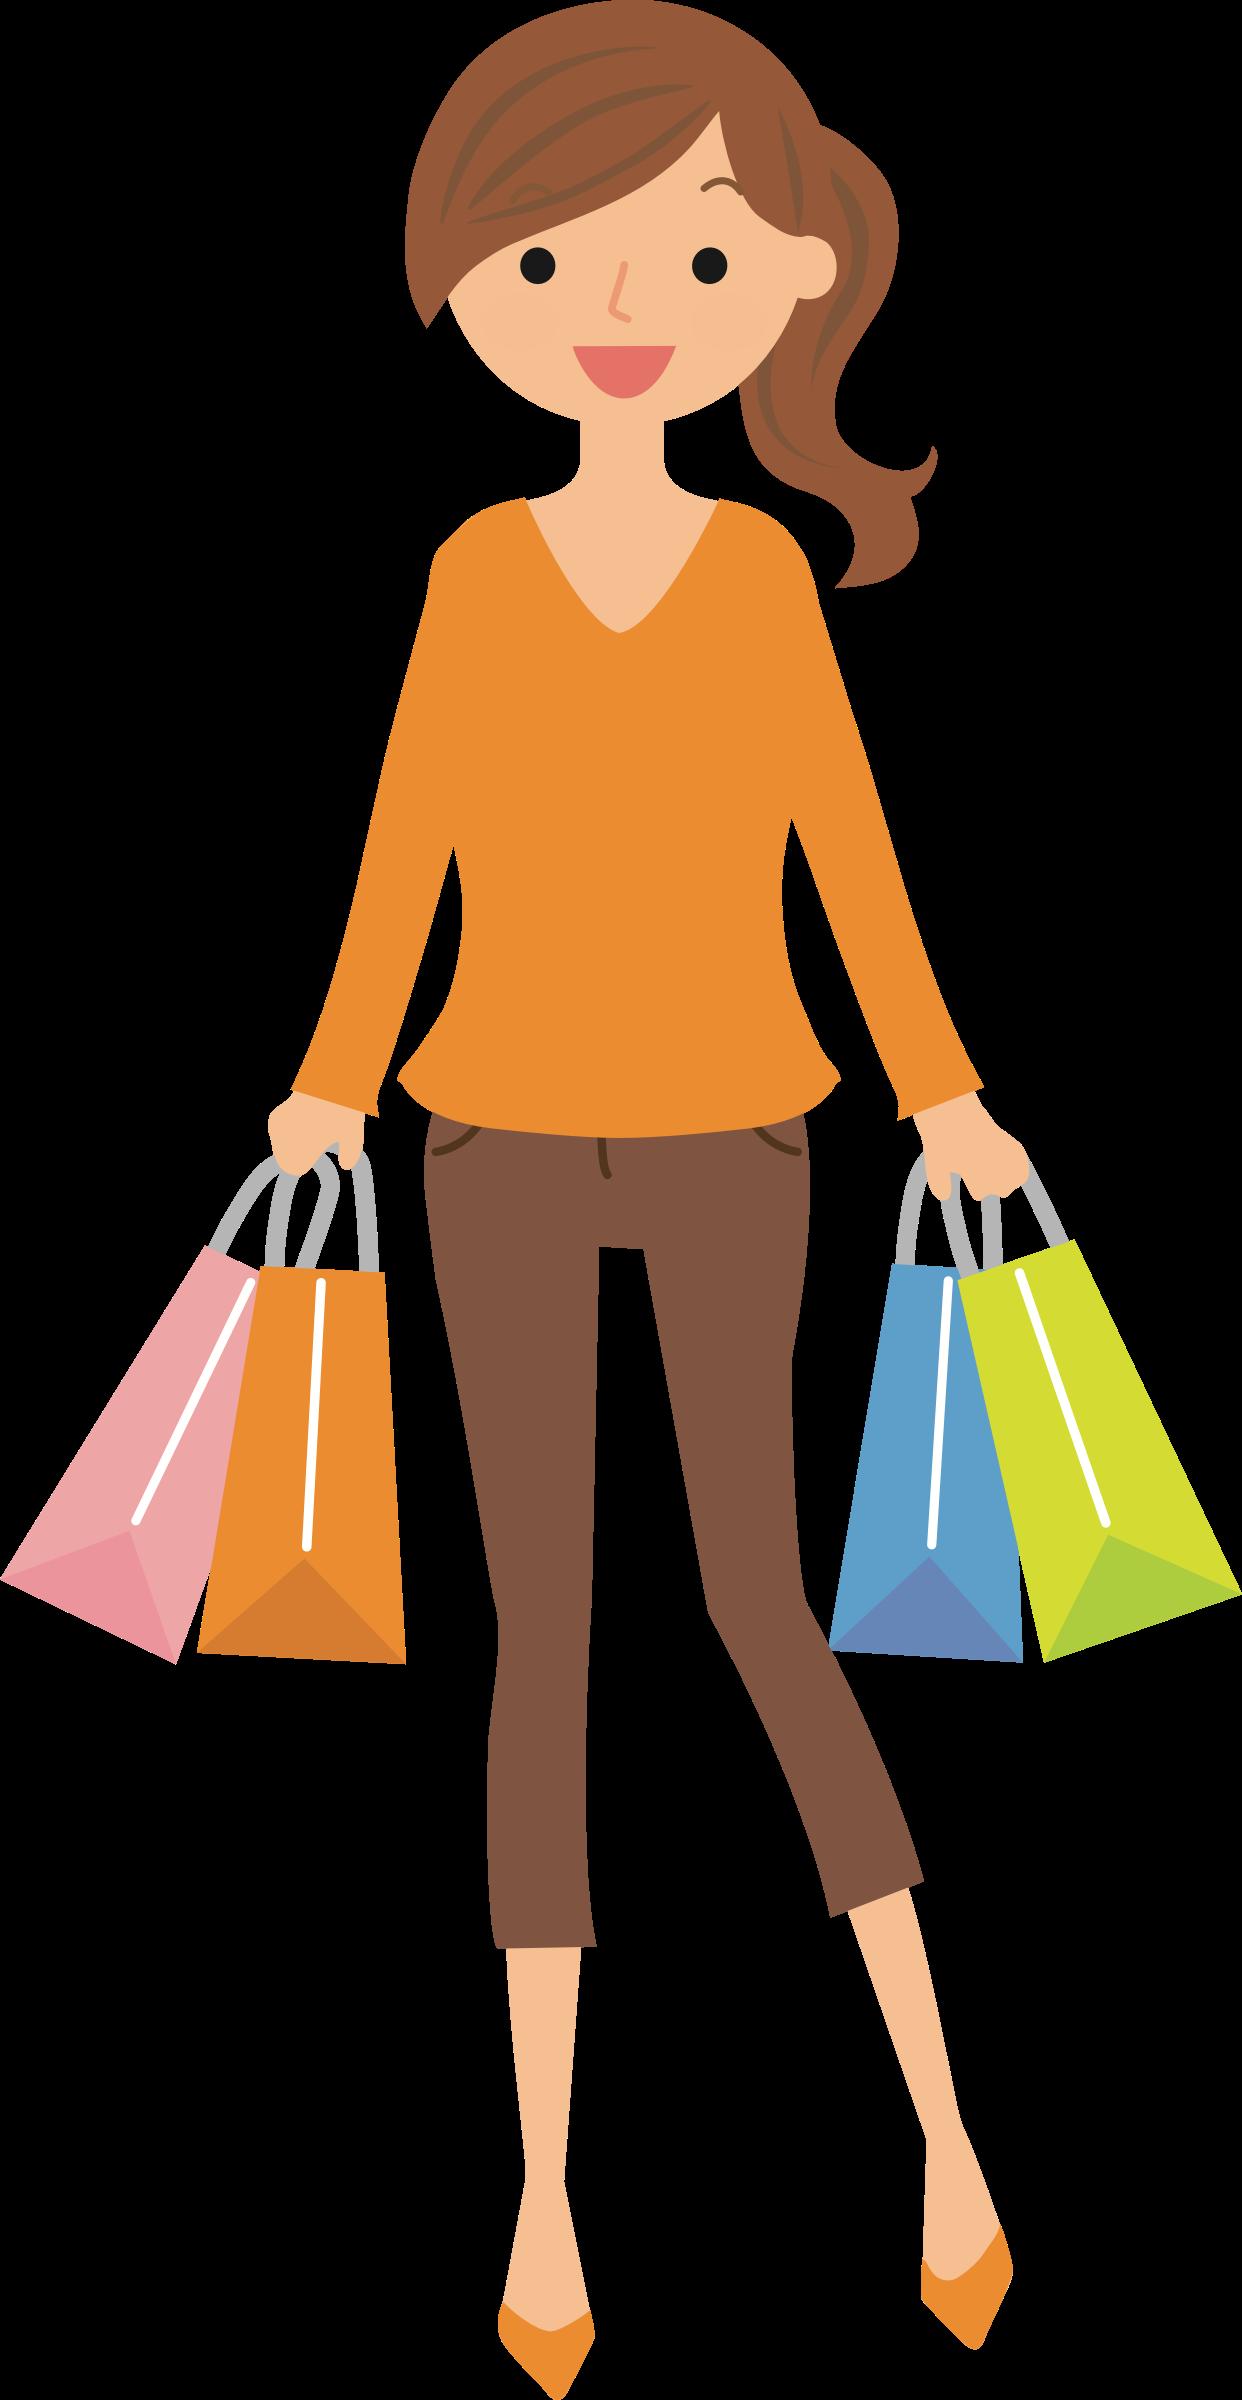 Female clipart customer, Female customer Transparent FREE for.